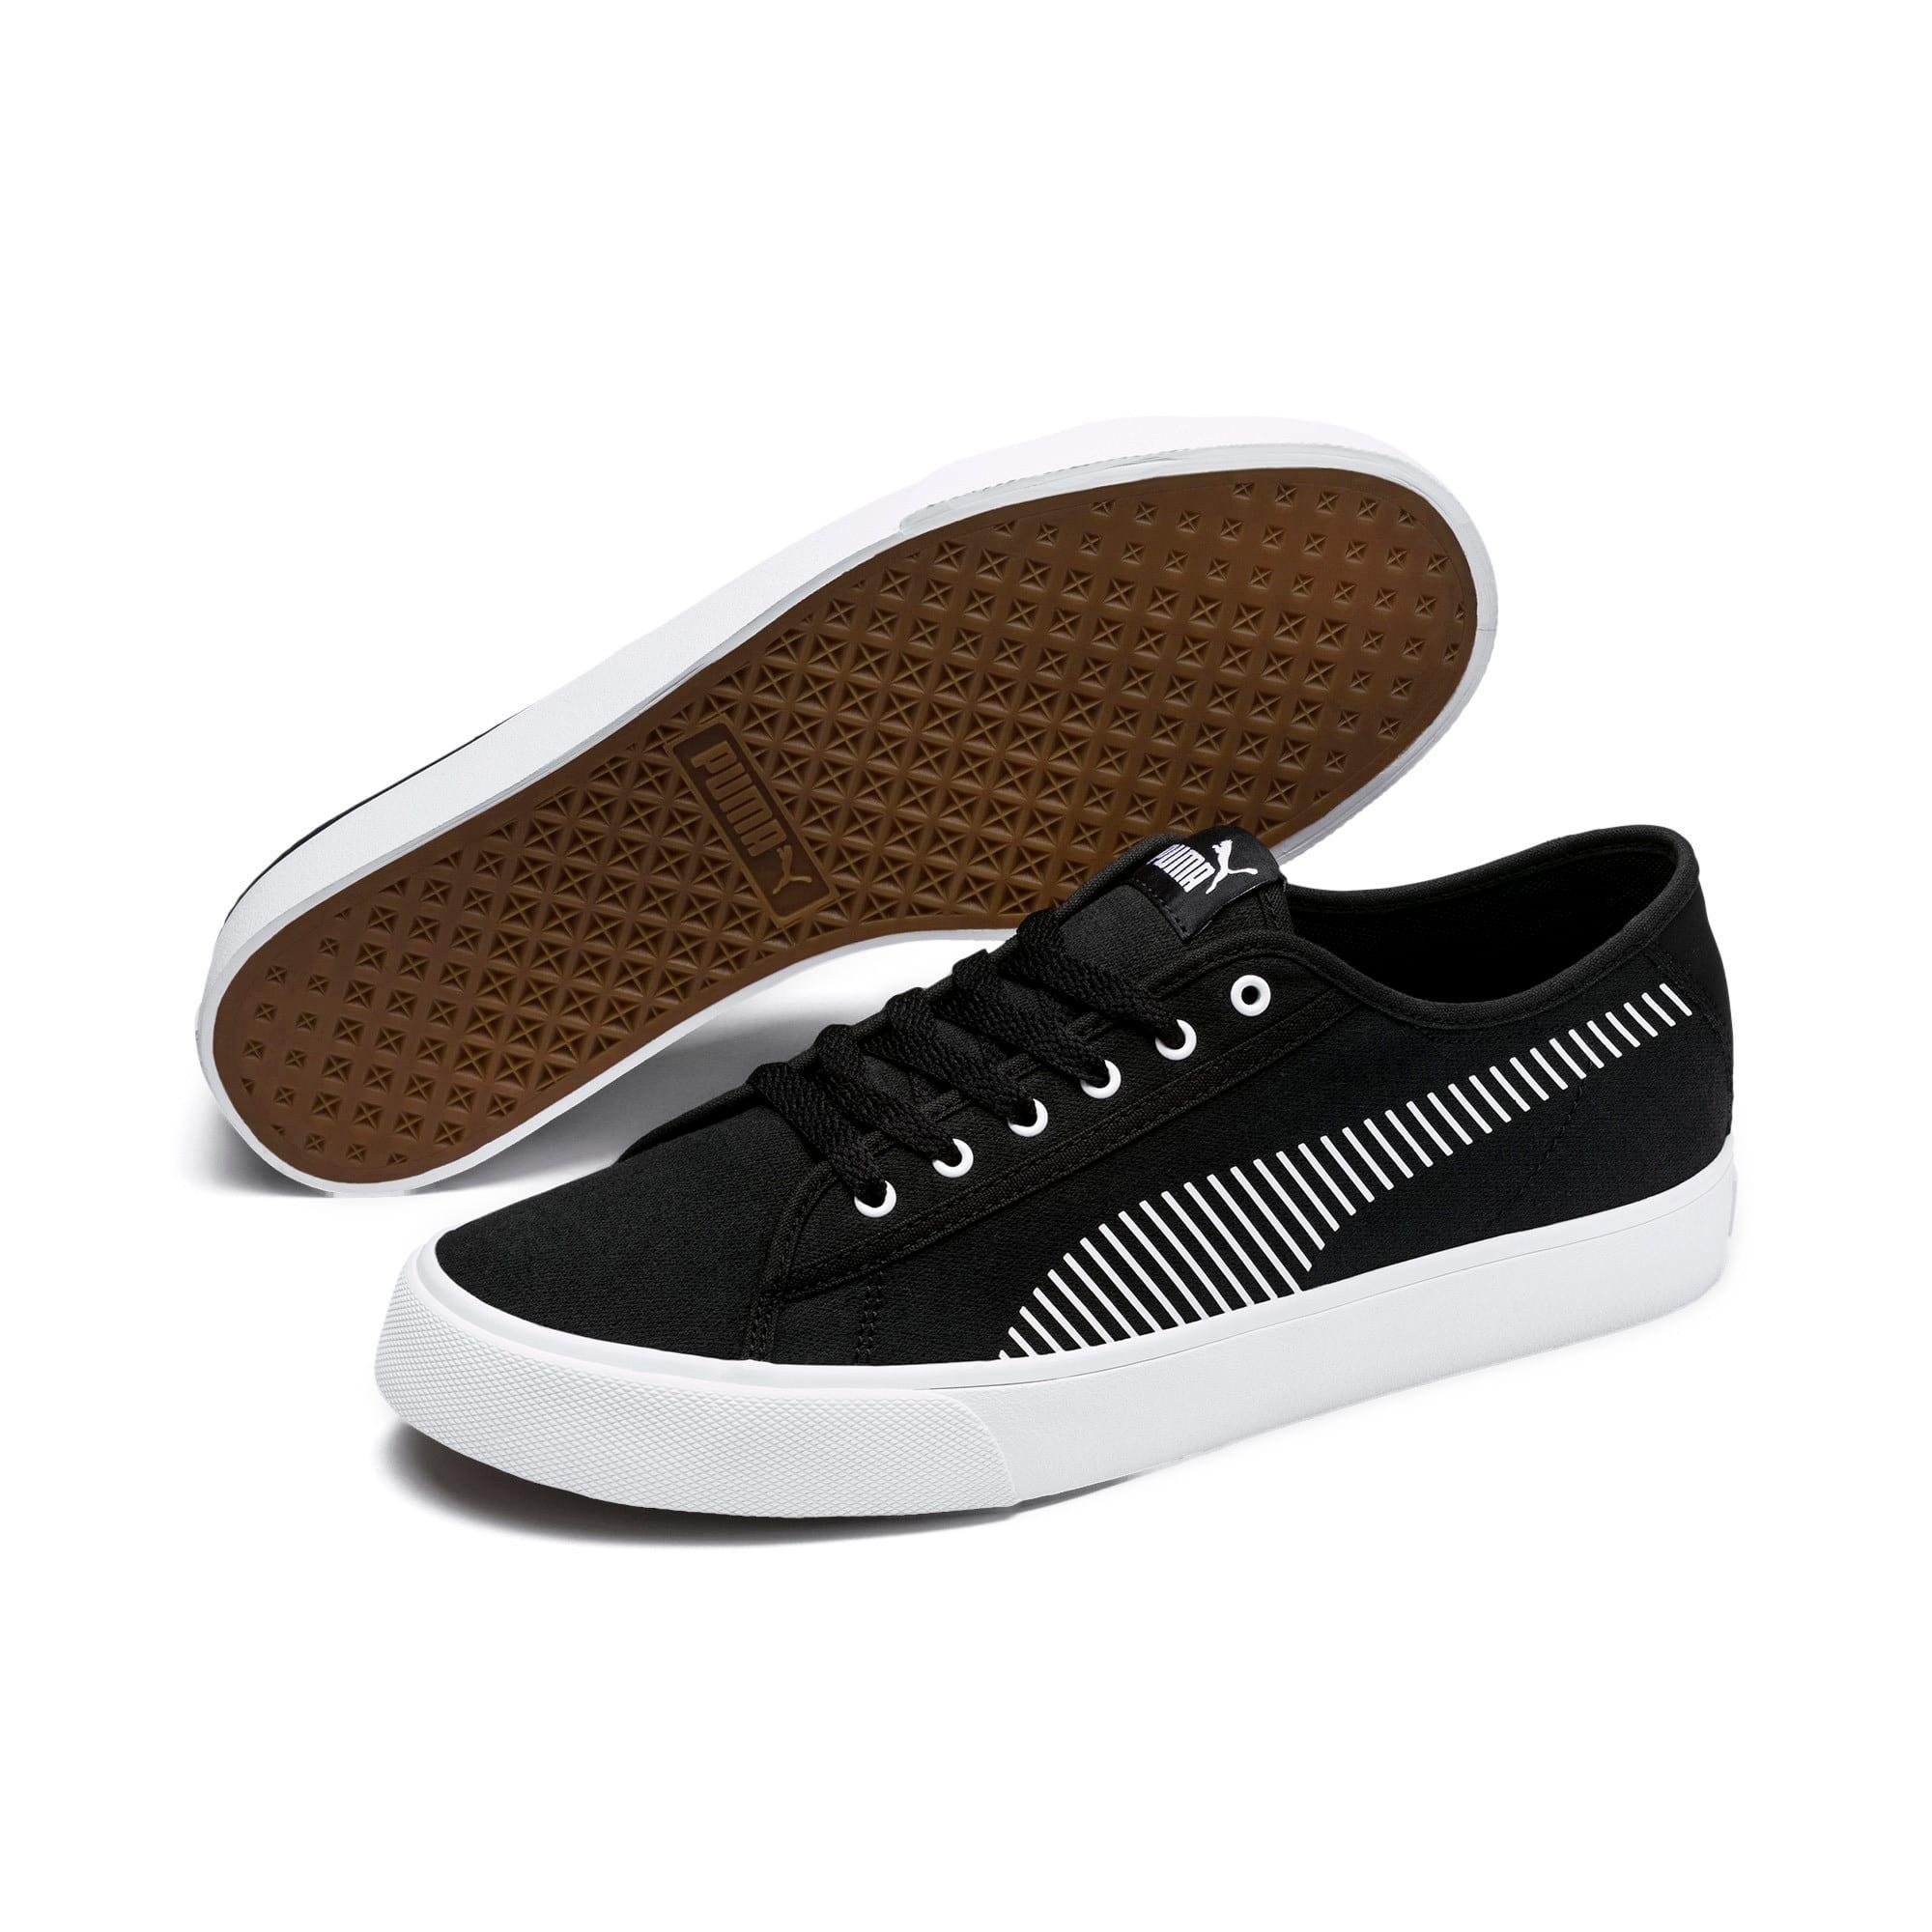 Thumbnail 2 of Bari Sneakers, Puma Black-Puma White, medium